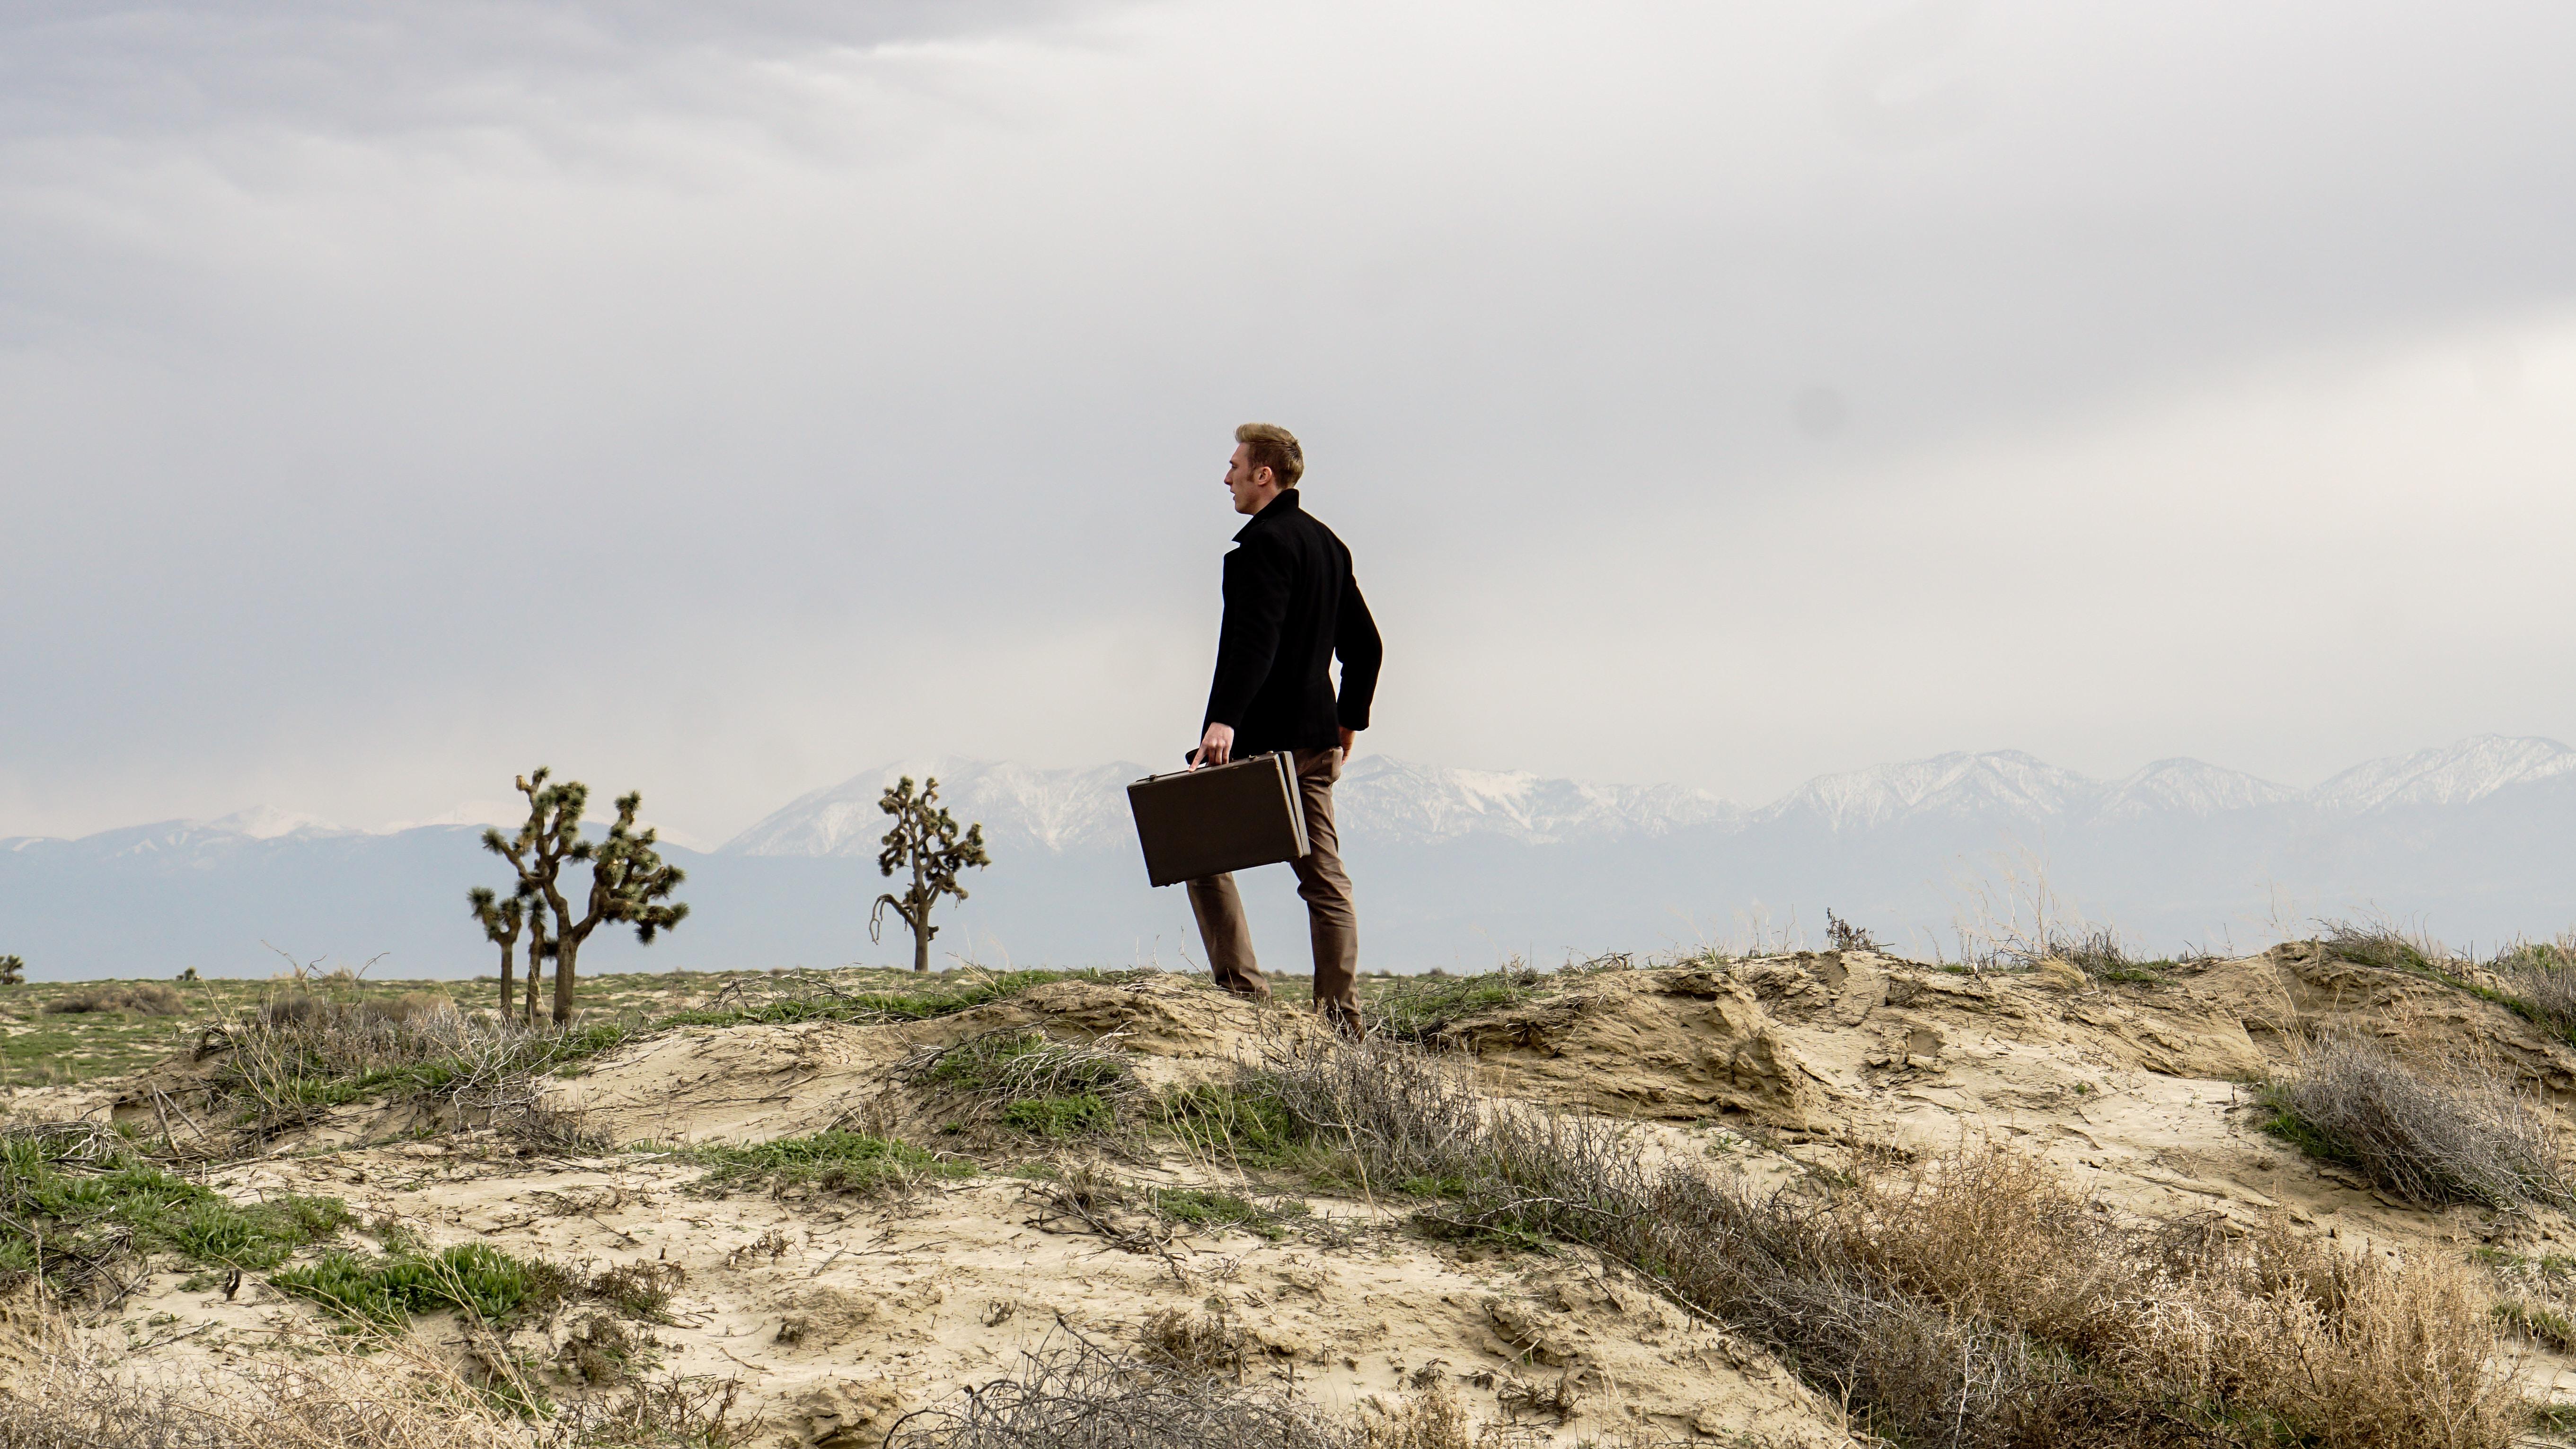 man standing on brown field grass during daytime